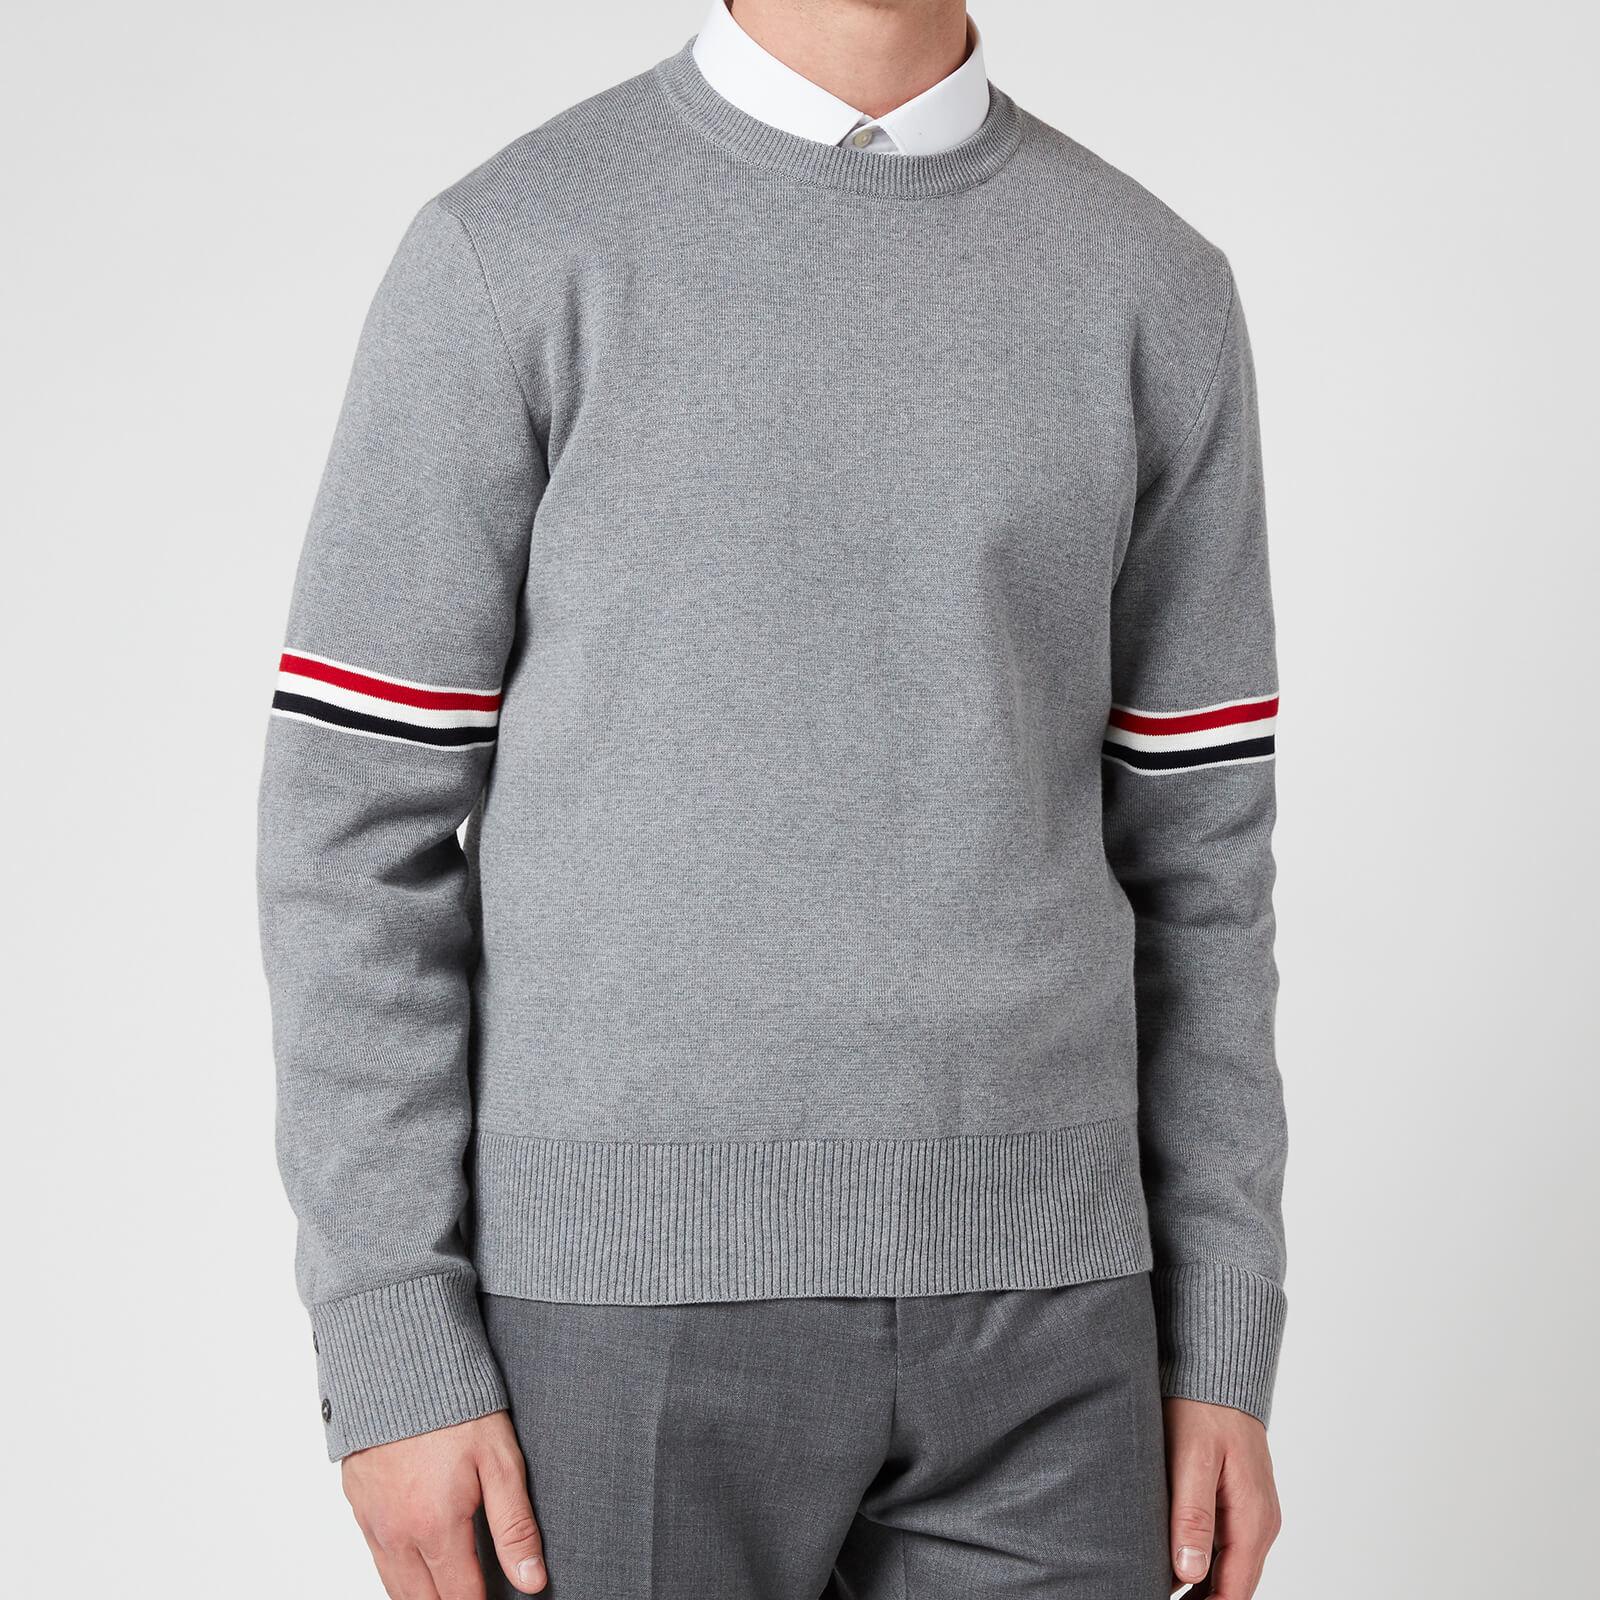 Thom Browne Men's Tricolour Stripe Crewneck Jumper - Light Grey - Free UK Delivery Available